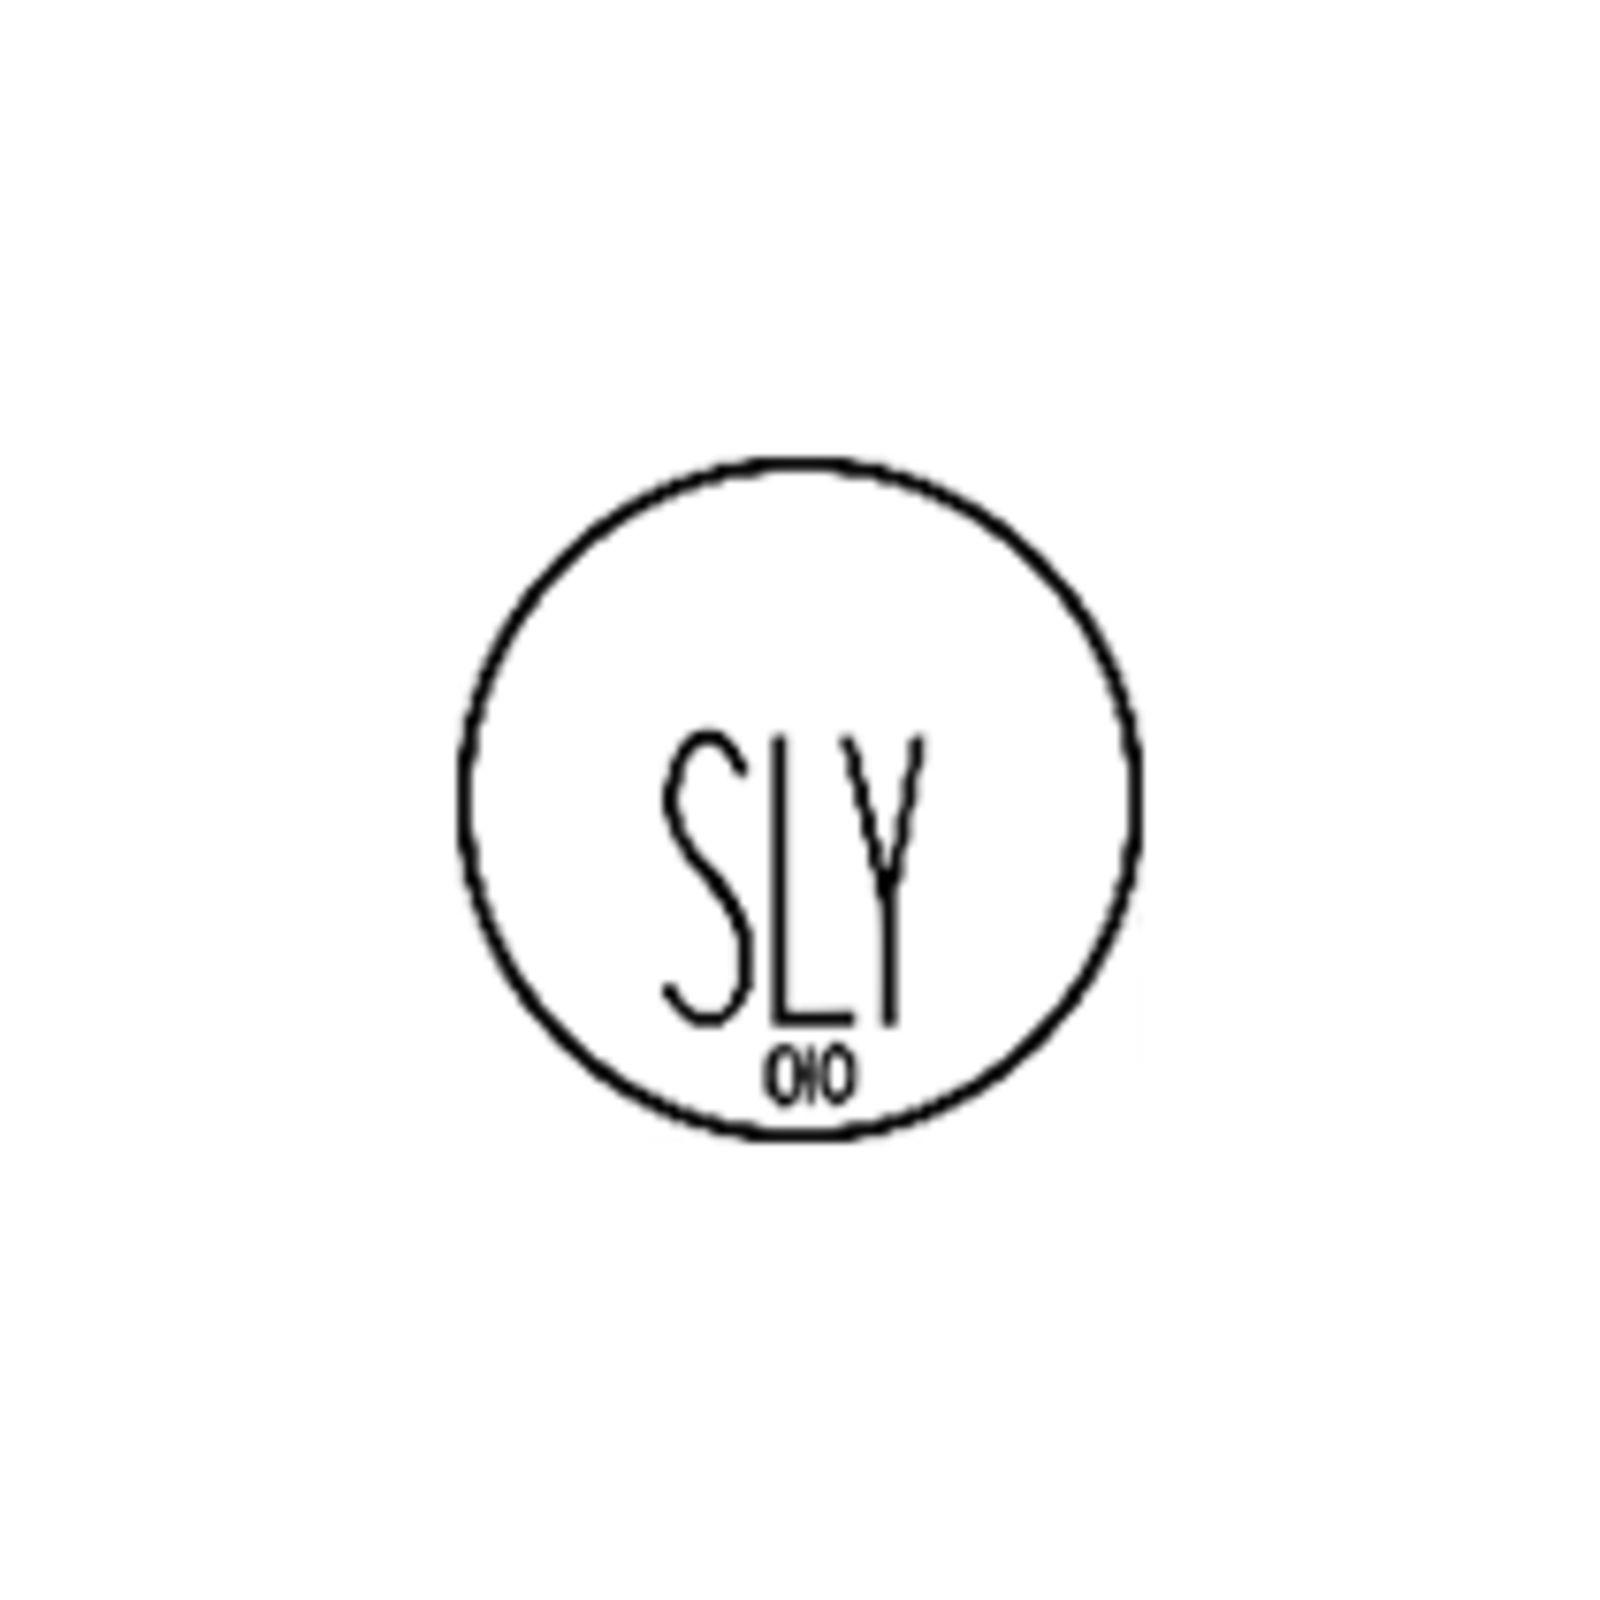 SLY 010